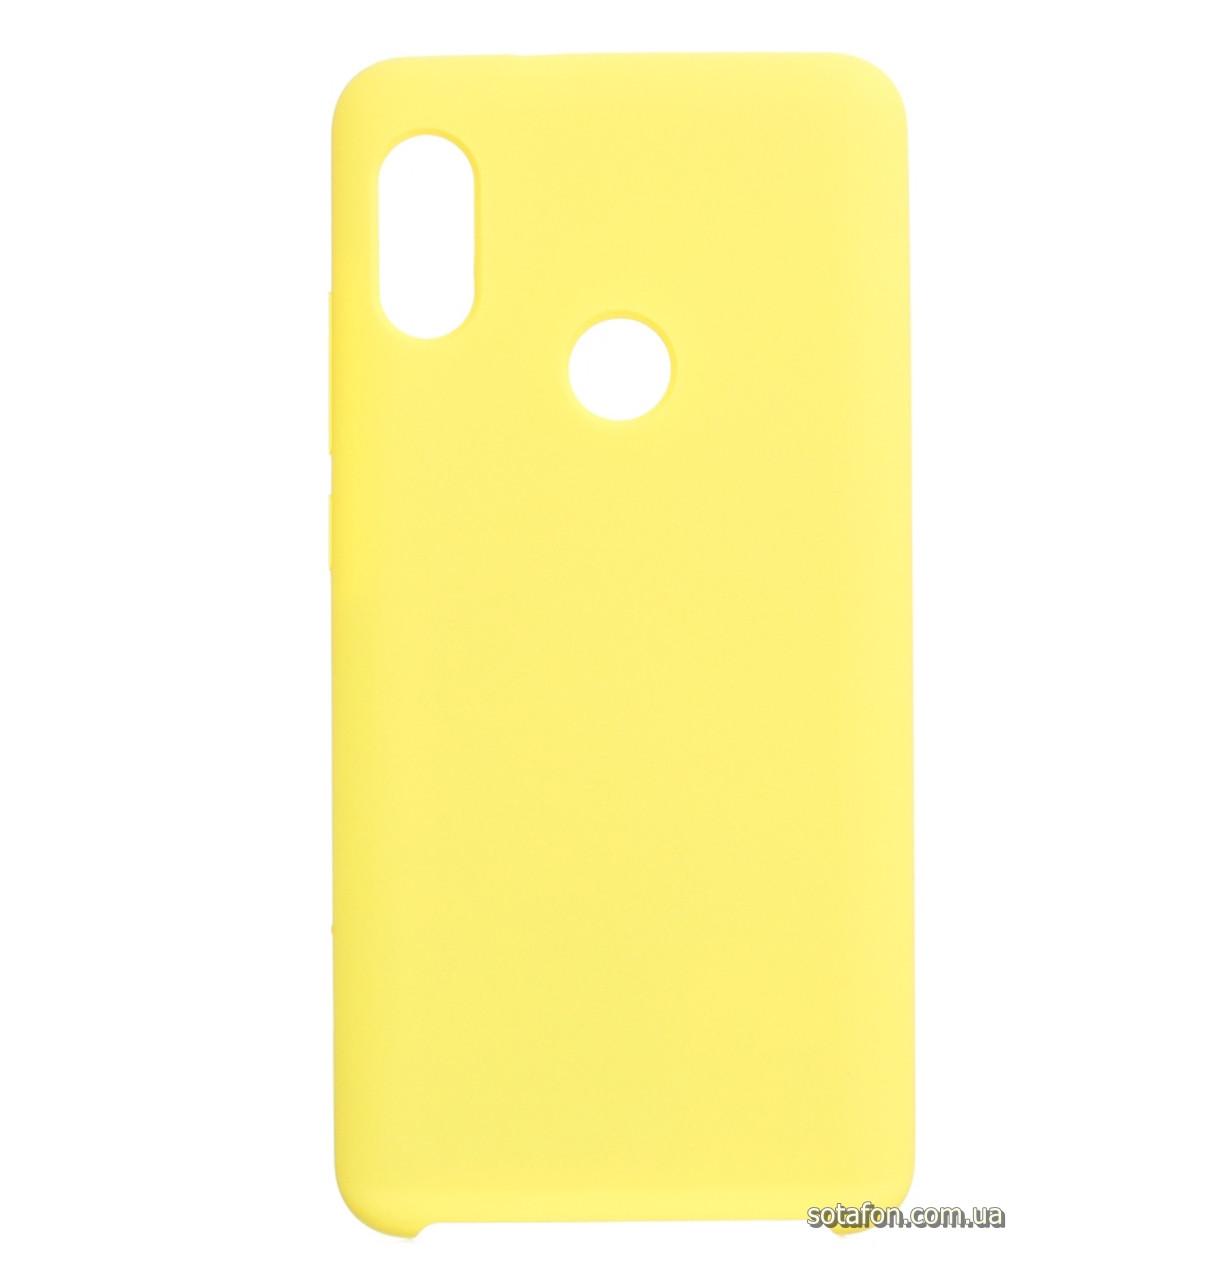 Чехол-накладка Original Silicone case на Xiaomi Redmi Note 5 Pro / Note 5 (AI Dual Camera) Yellow